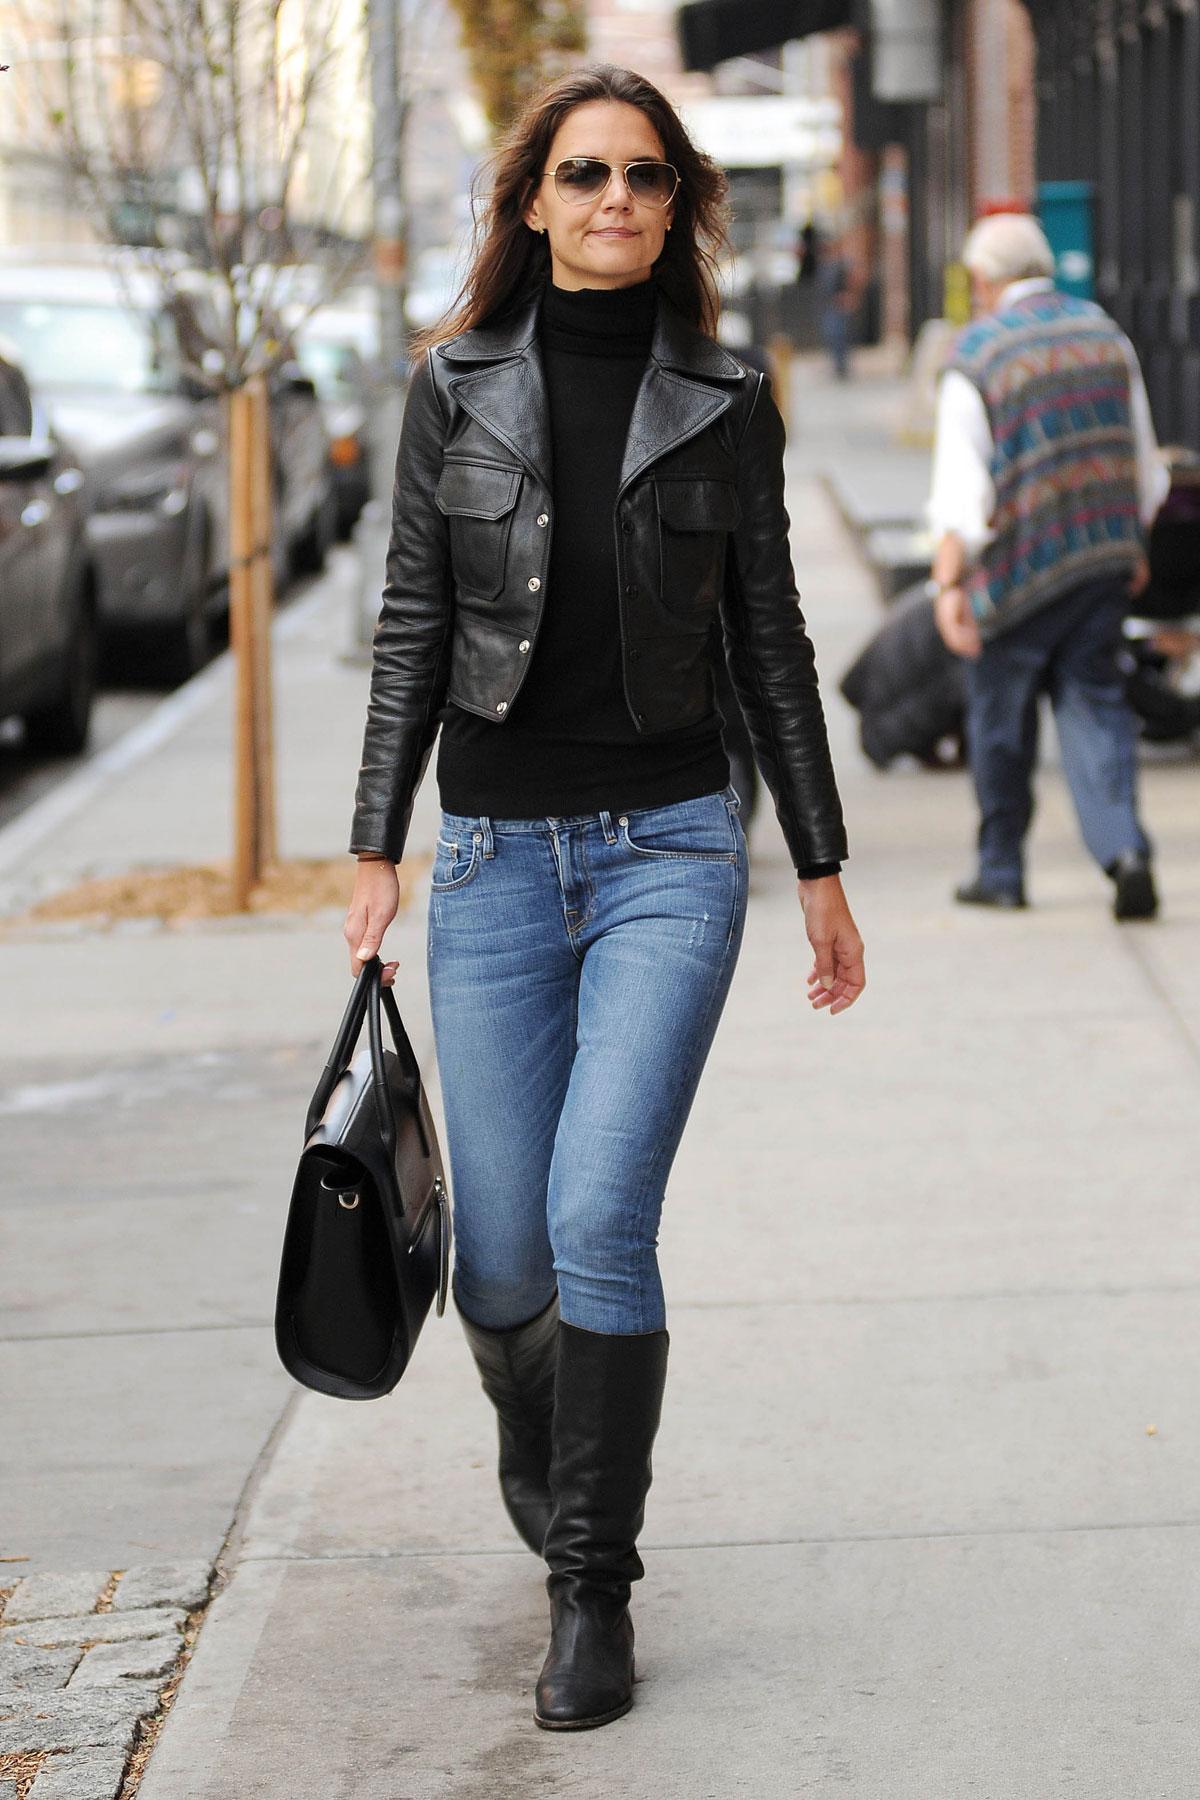 Kylie Jenner Light Brown Hair